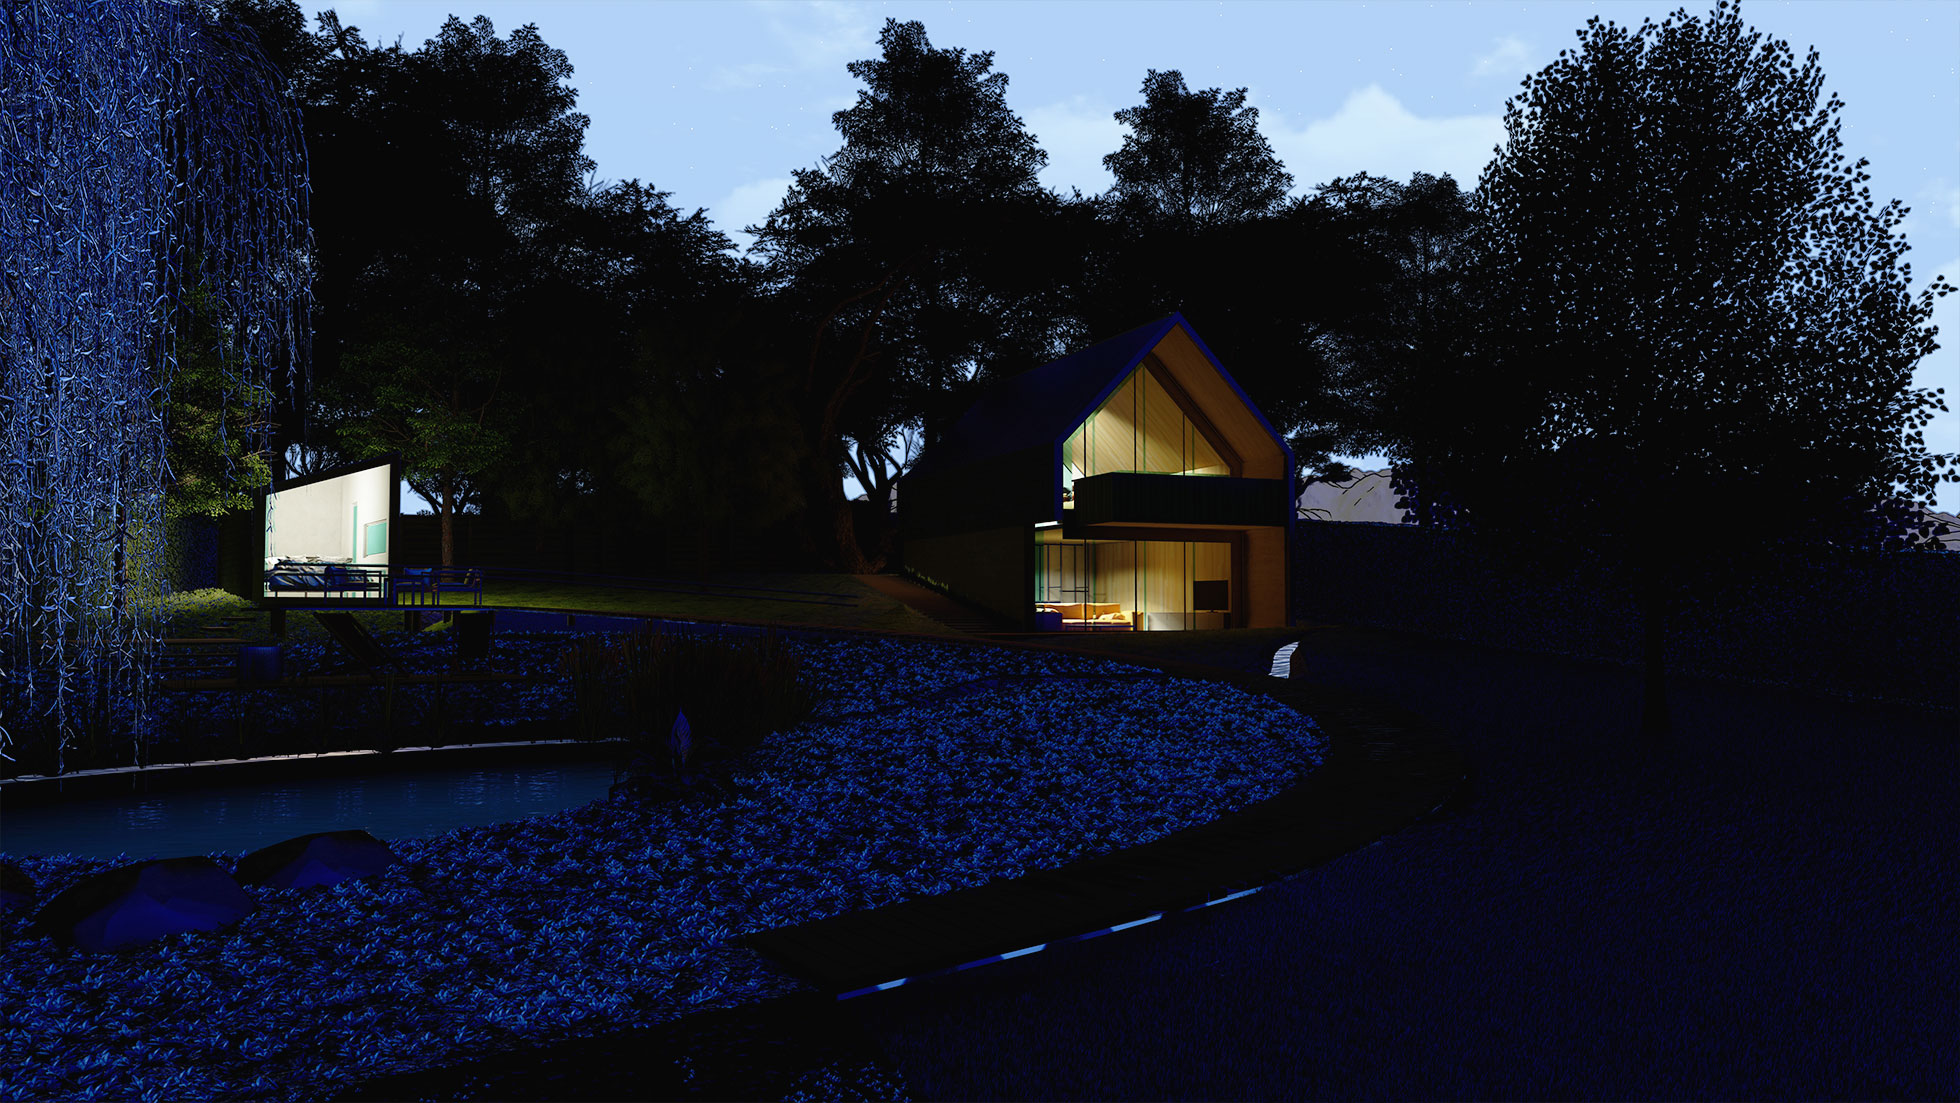 landscape architecture, landscape design, opop studio, željko radišić